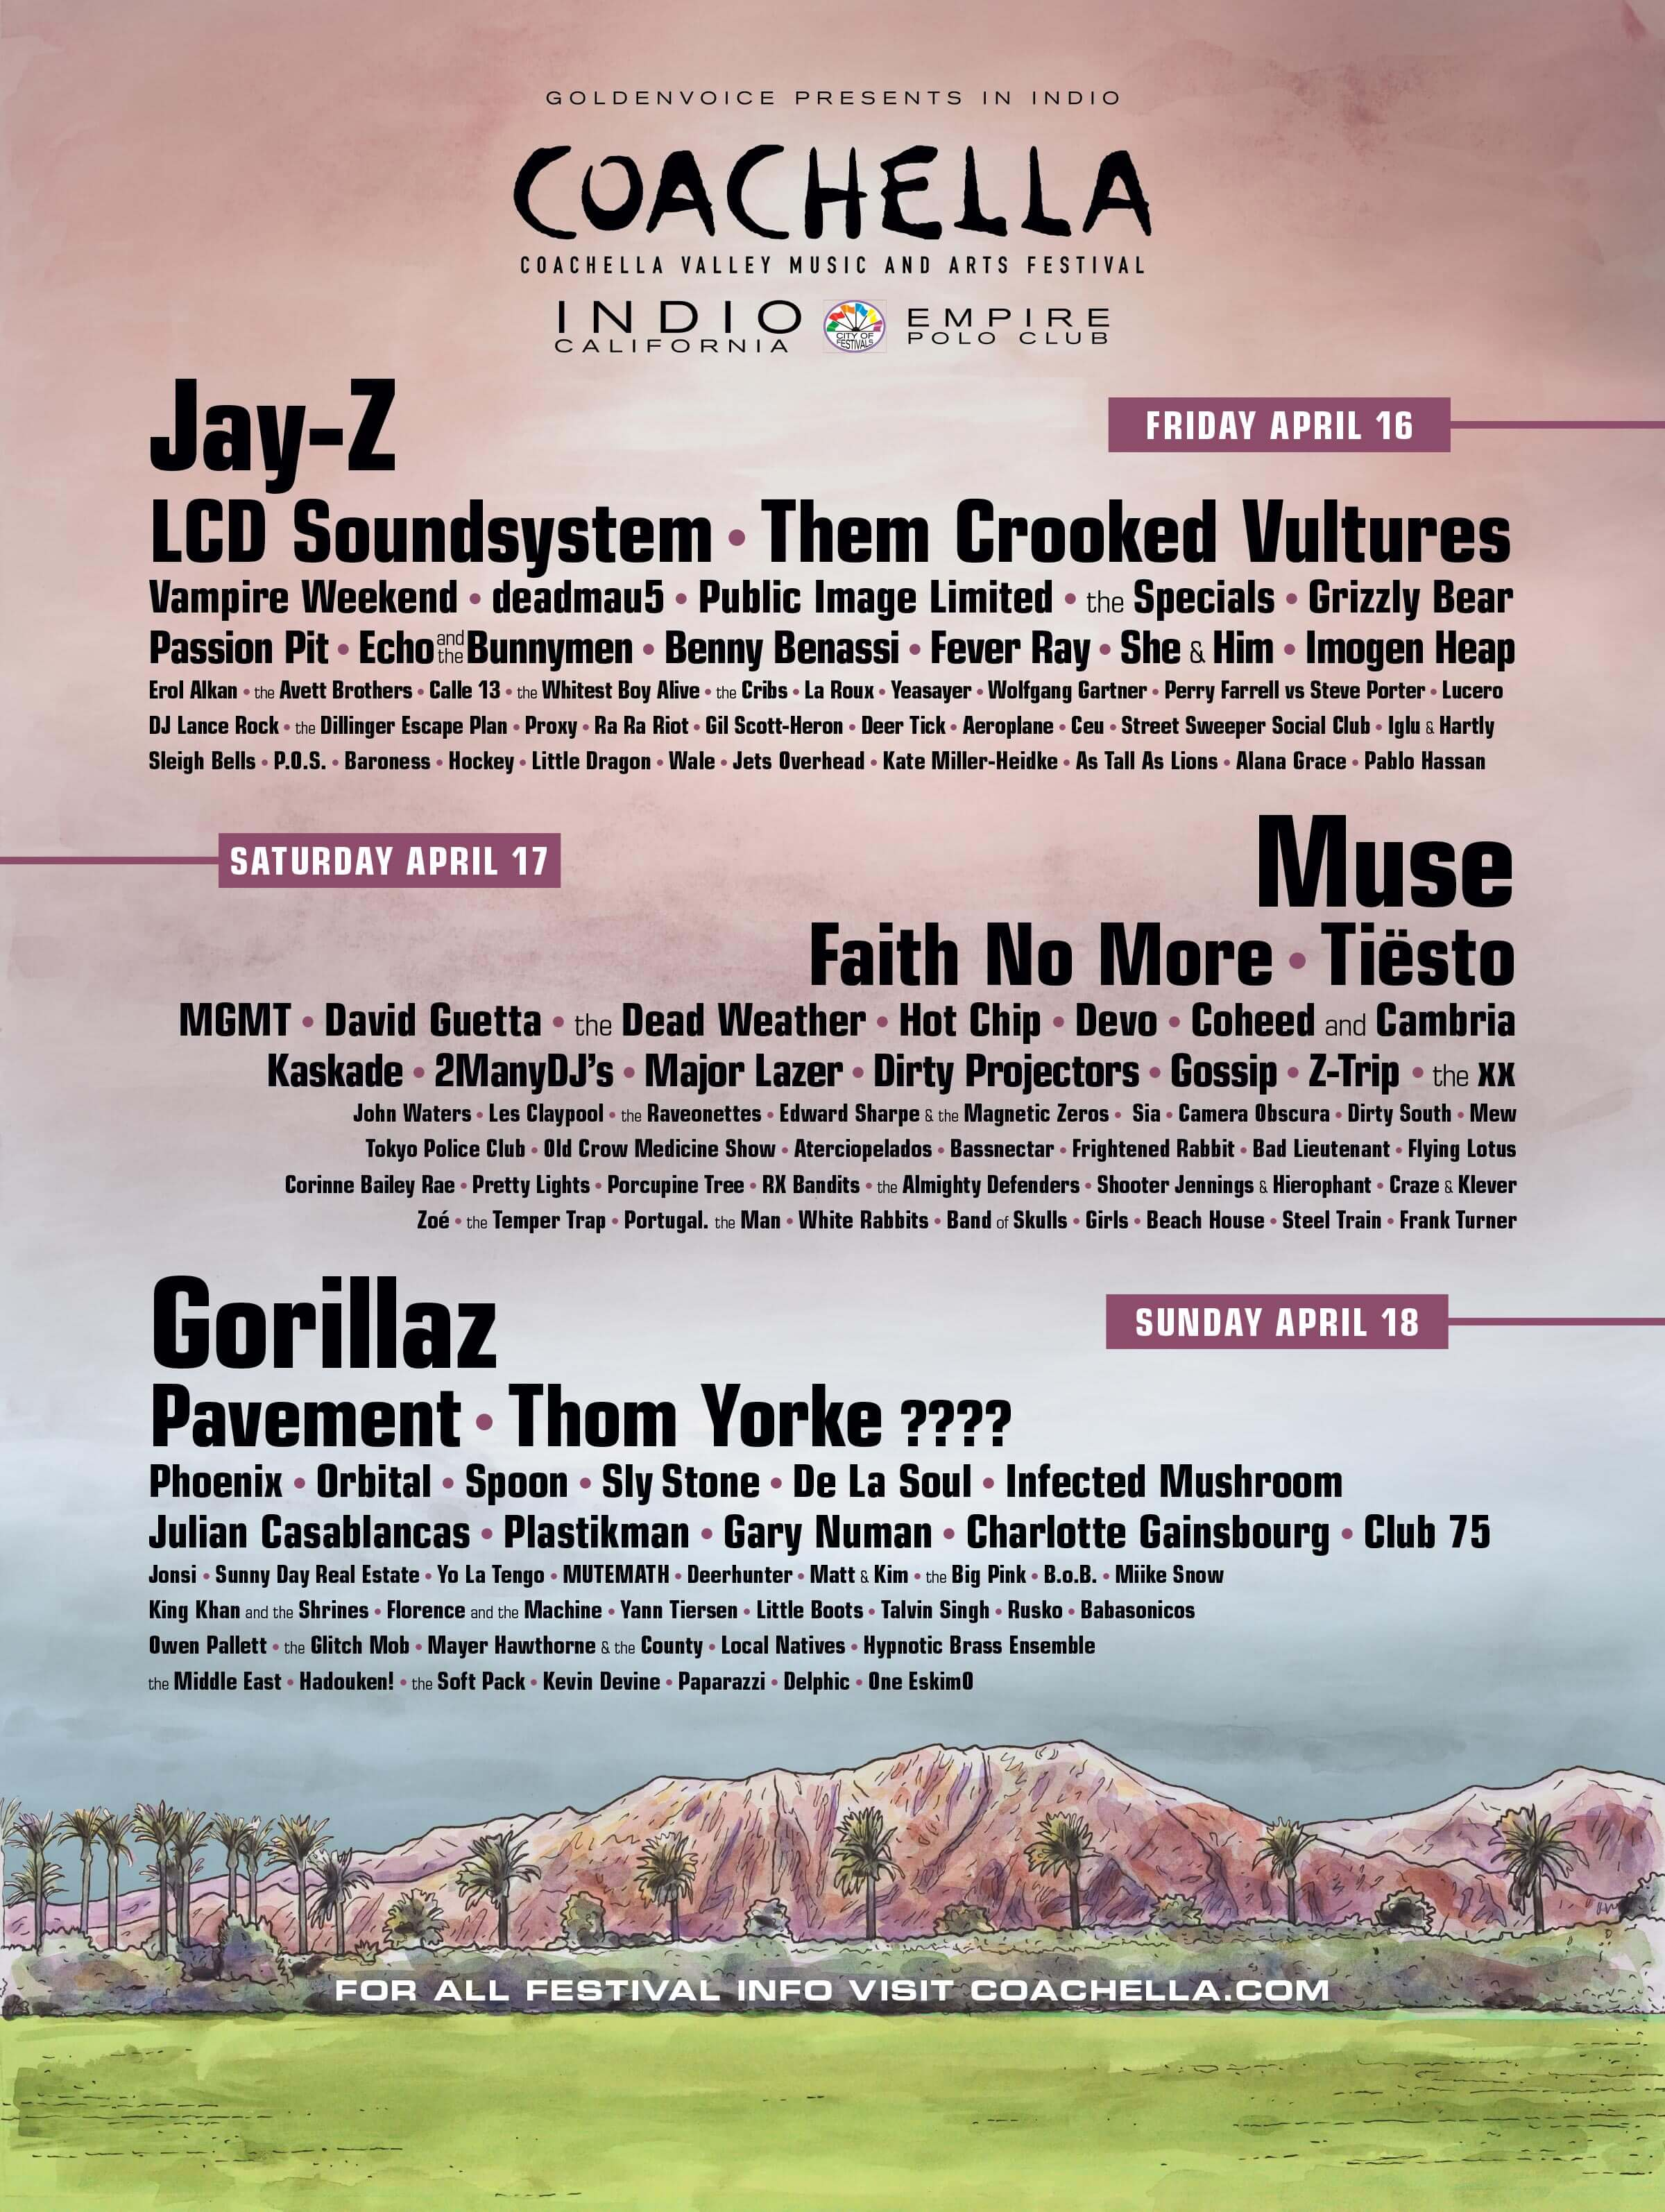 Coachella 2010 Lineup Poster